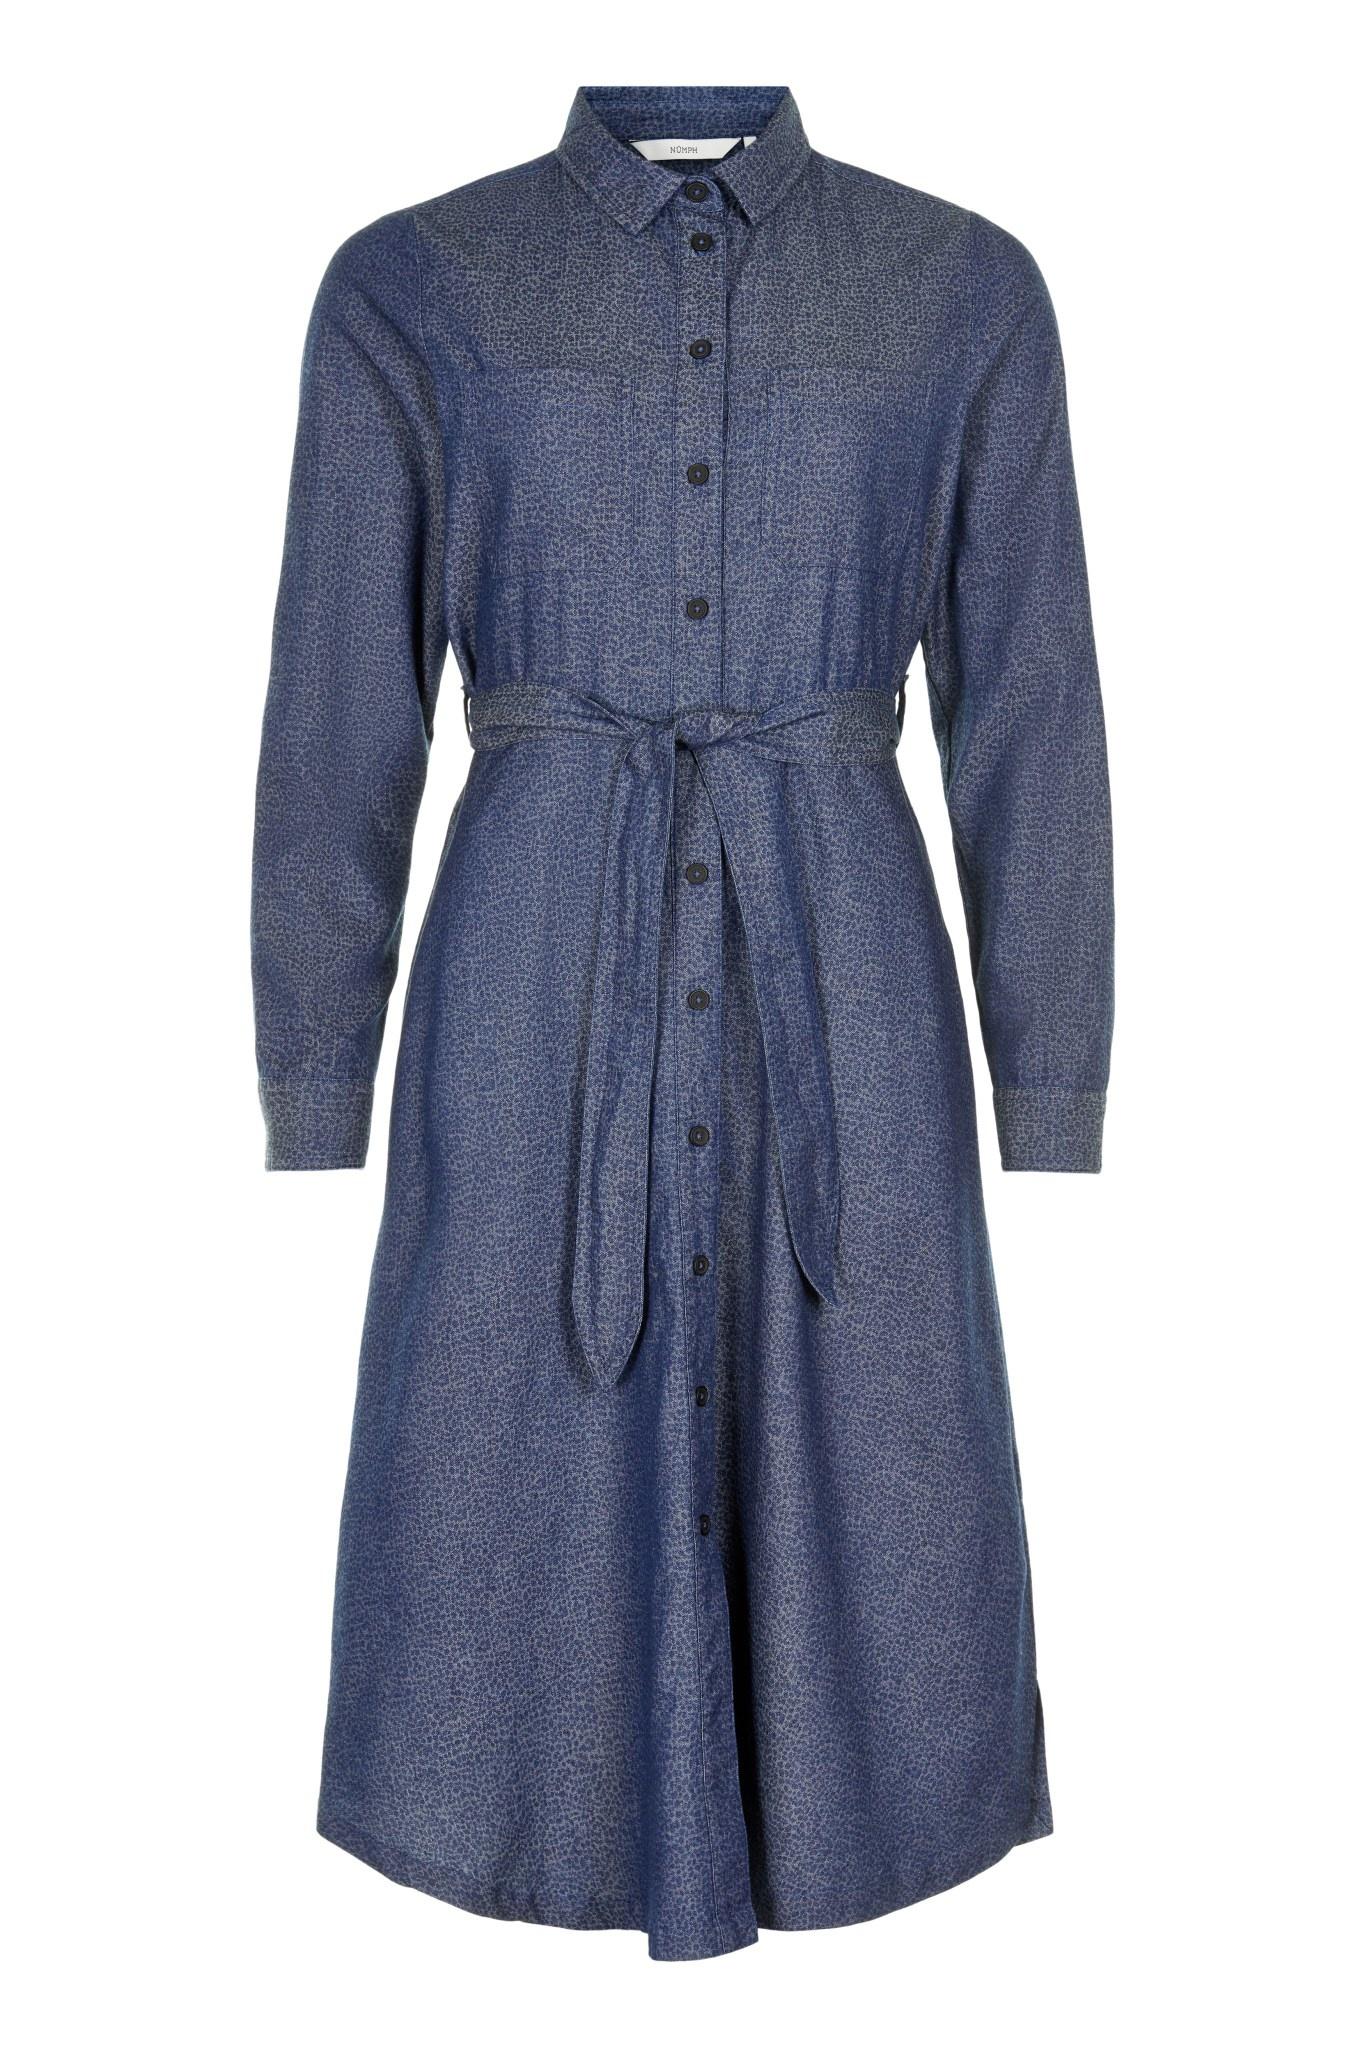 Nümph Brinsley Dress